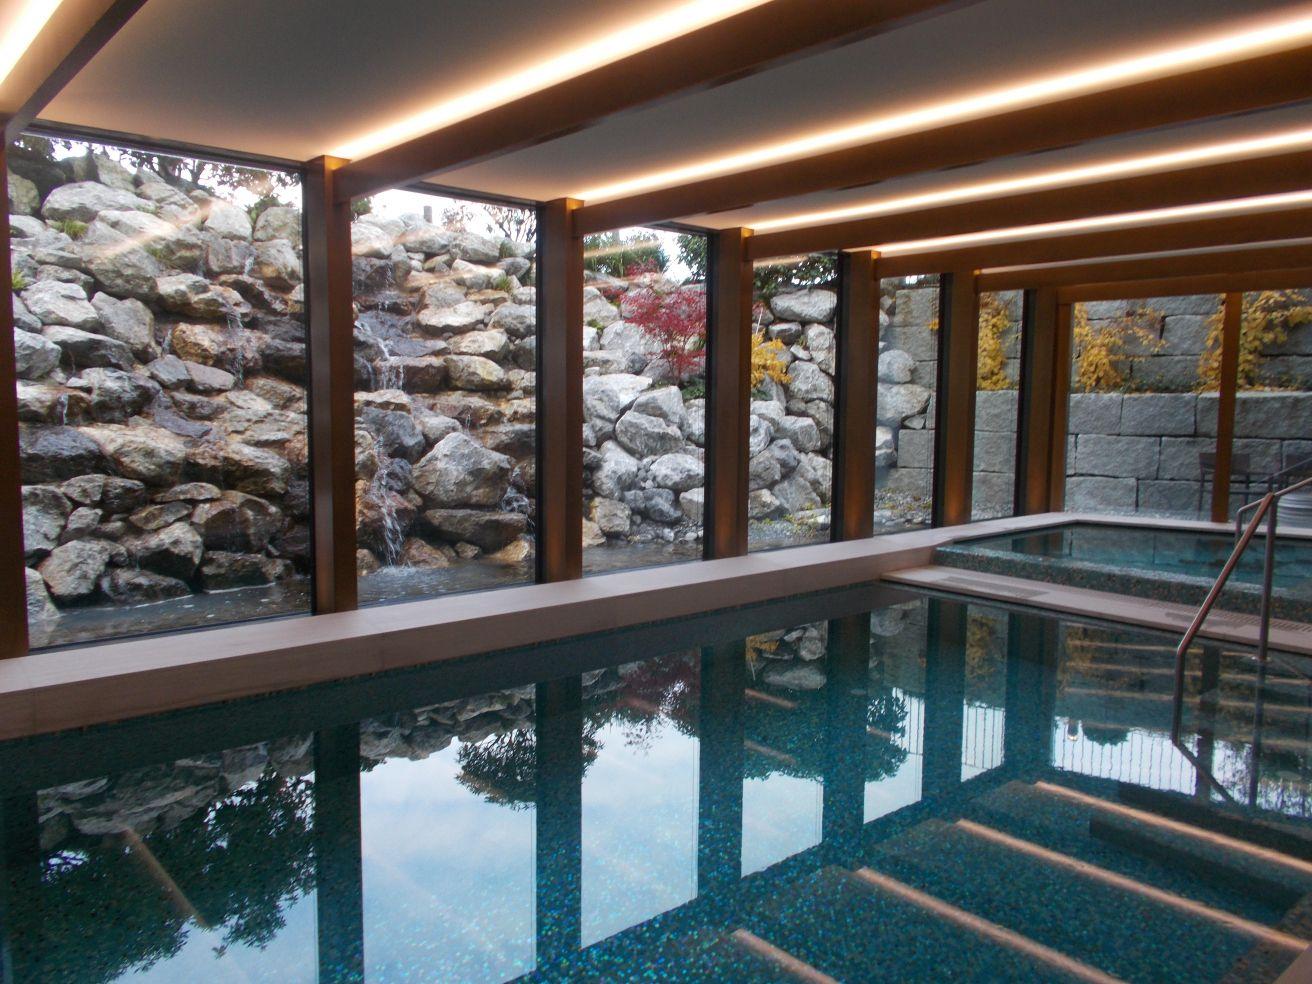 Review Of Hotel Atlantis By Giardino Zurich Switzerland Atlantis Zurich Places